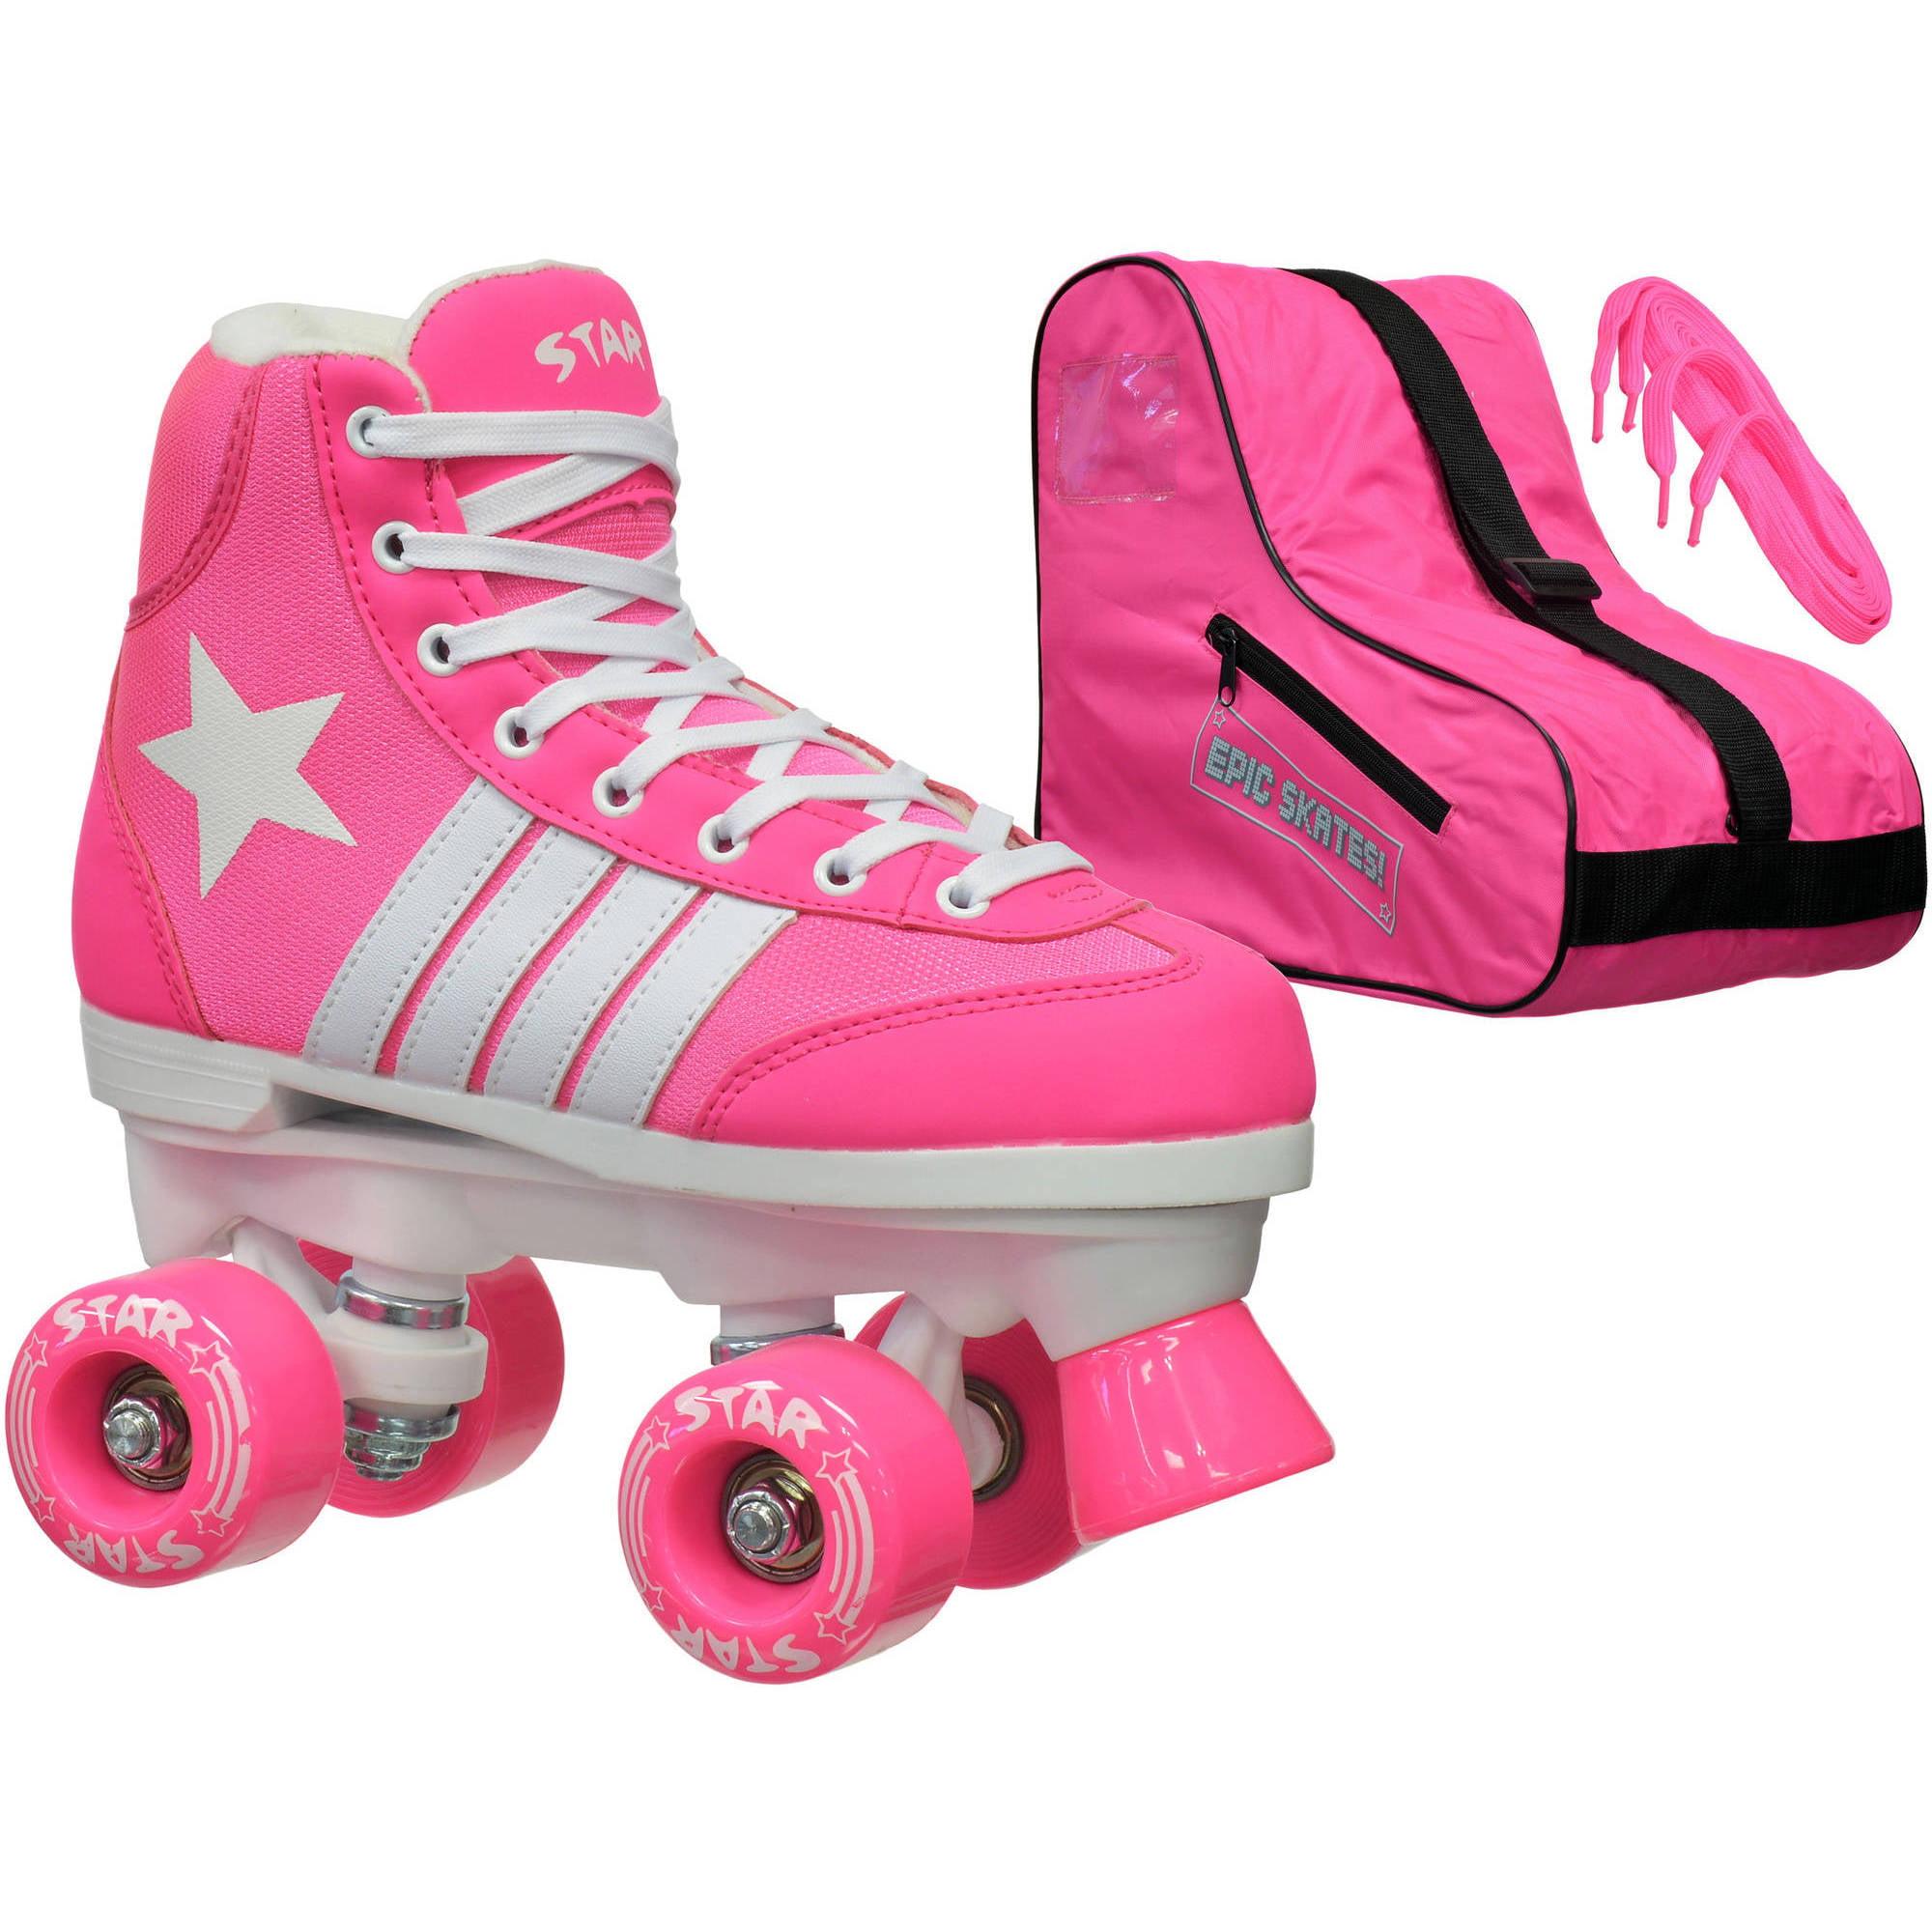 Epic Skates Epic Youth Star Carina Pink Quad Roller Skates Package